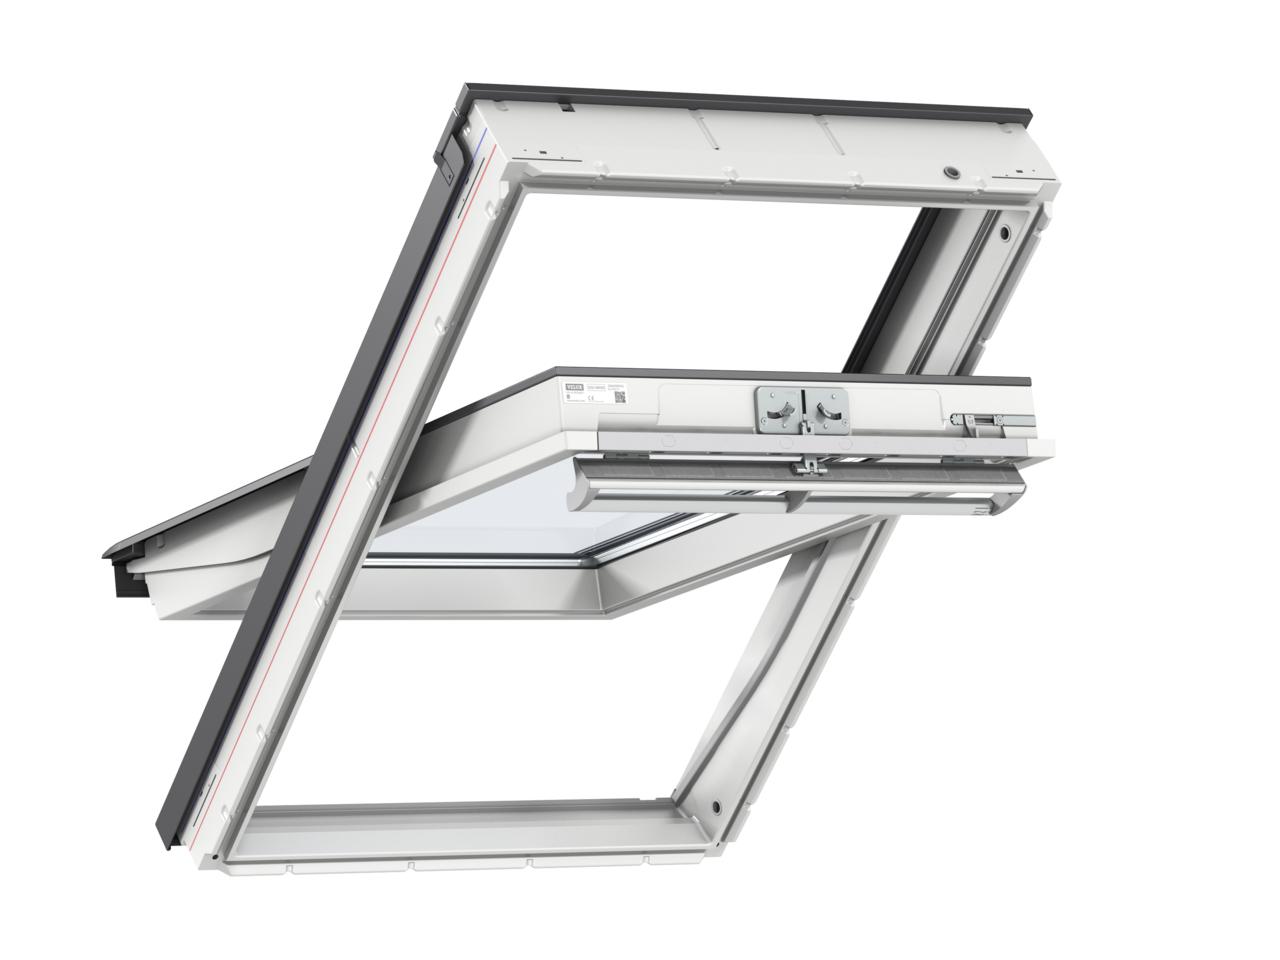 Velux GGU CK04 550 x 980mm Centre Pivot 34Pane Roof Window - White Polyurethane